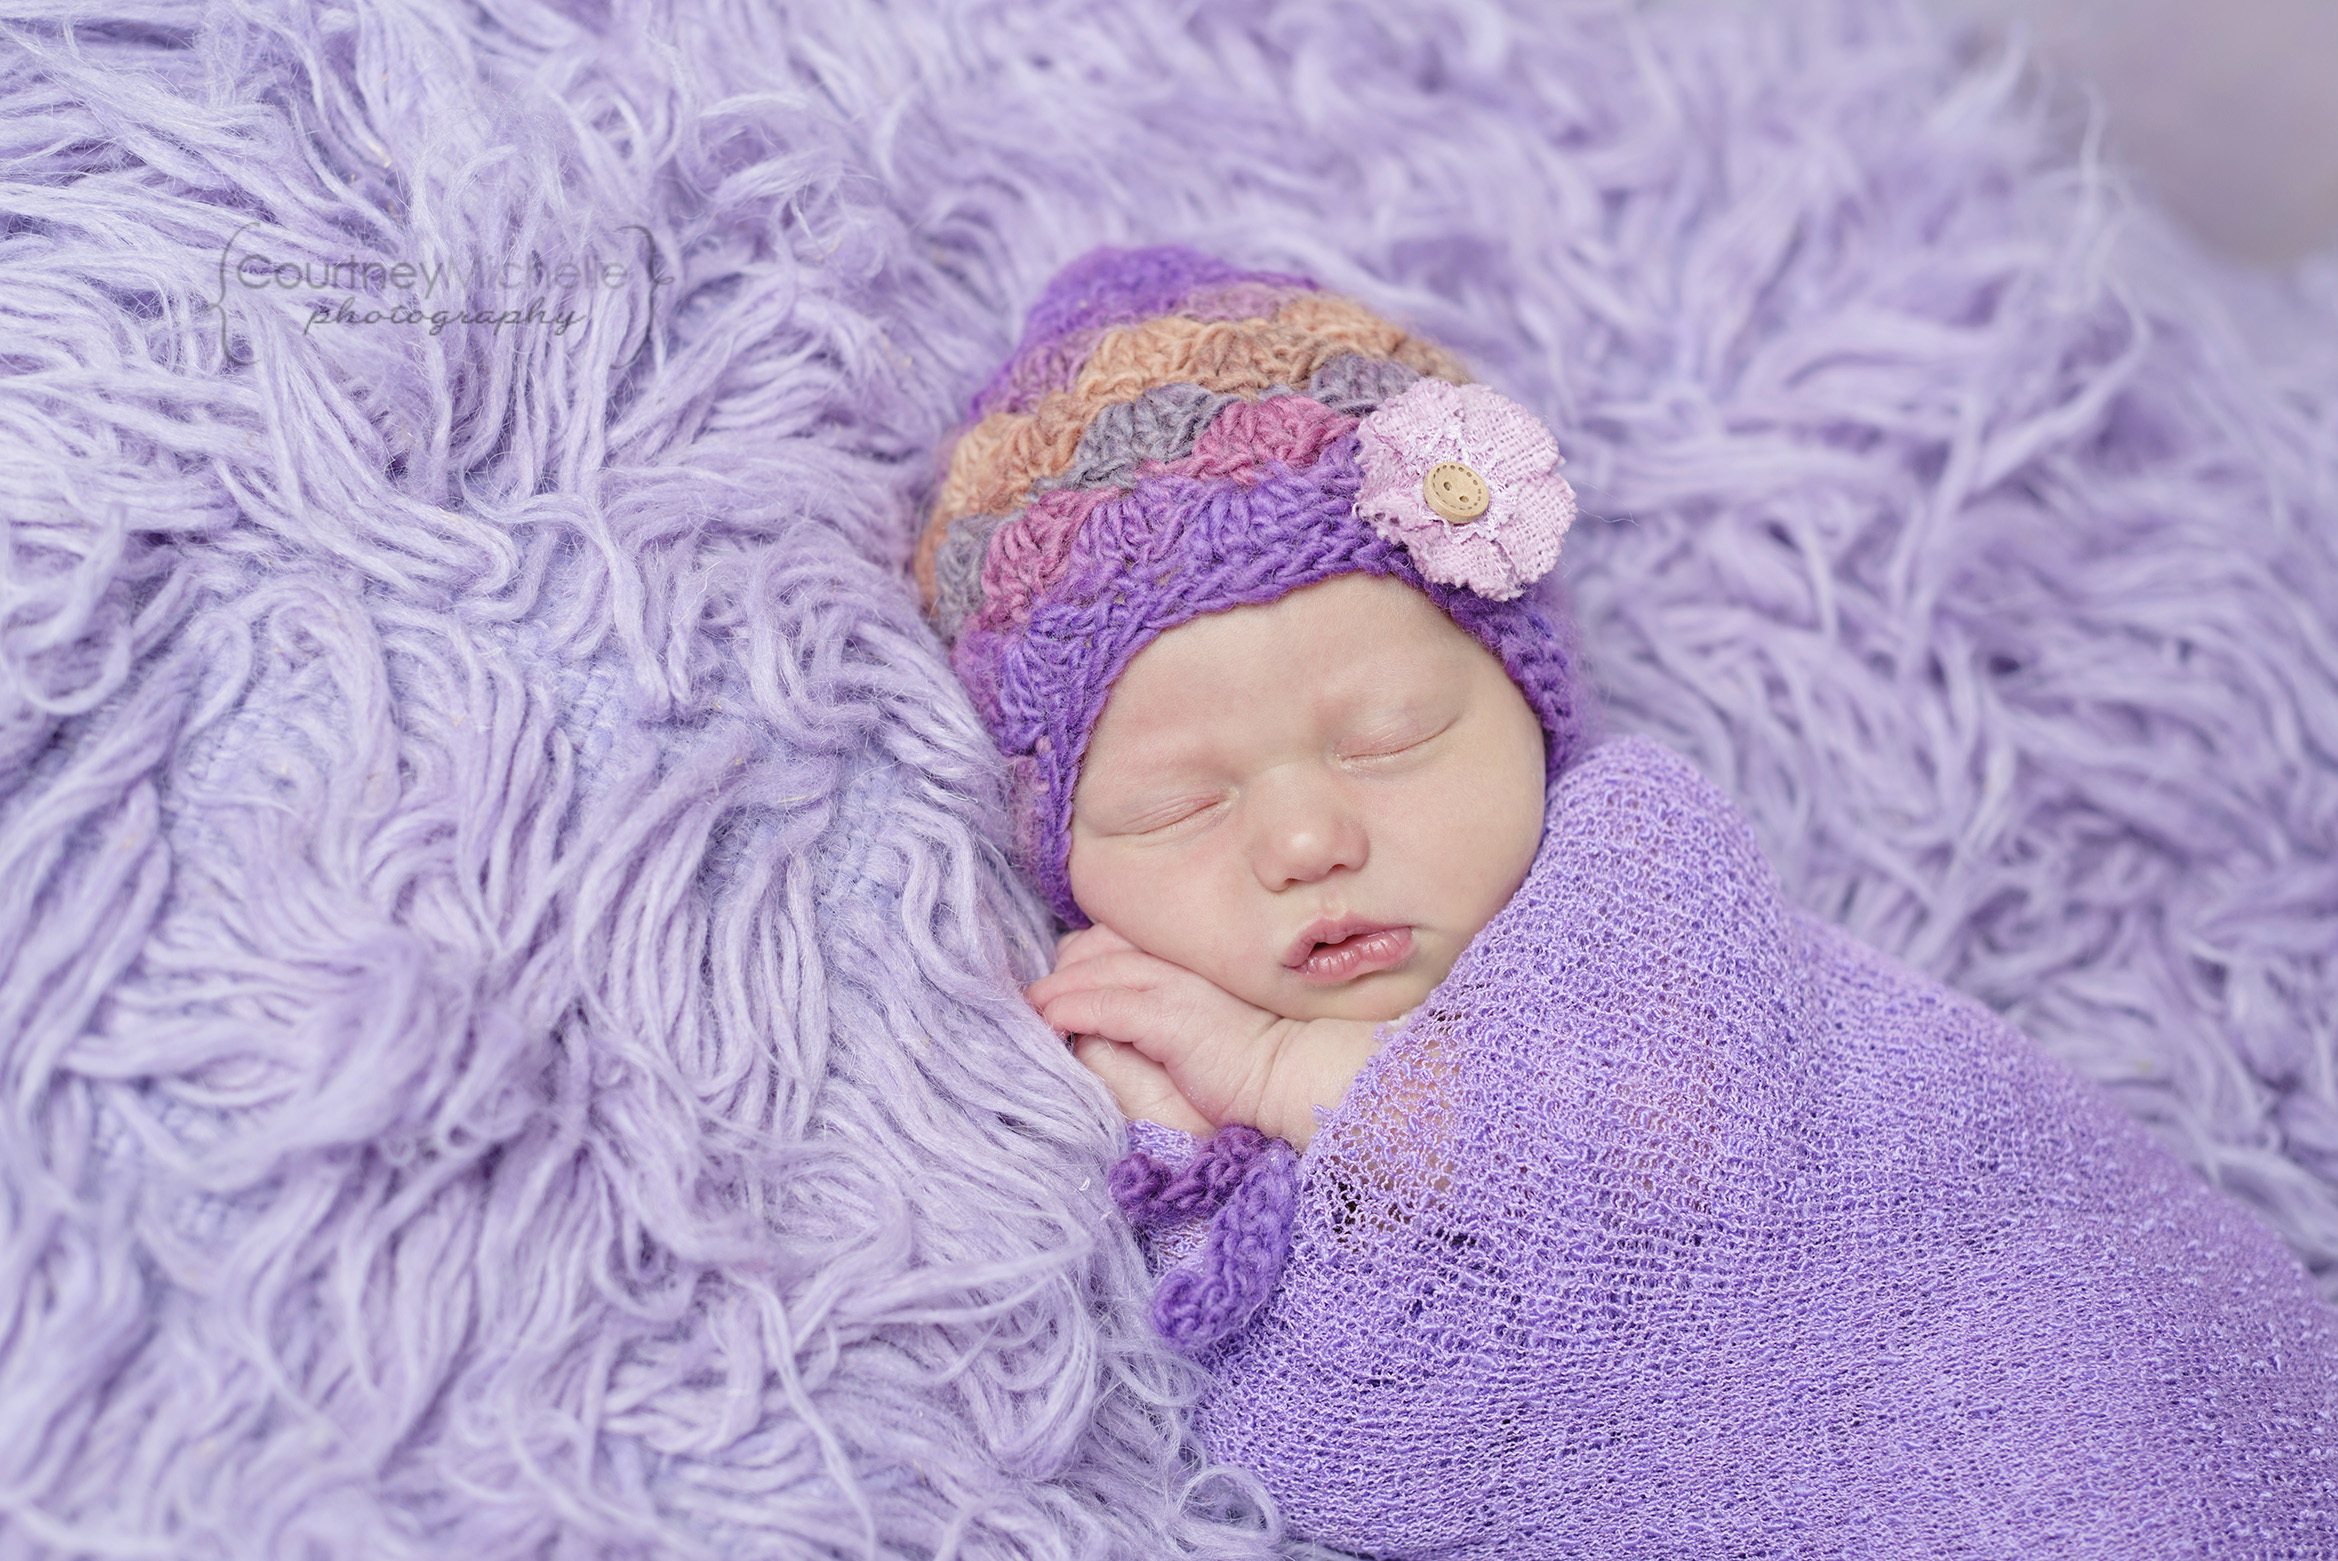 chicago-newborn-photographer©COPYRIGHTCMP-5185edit.jpg